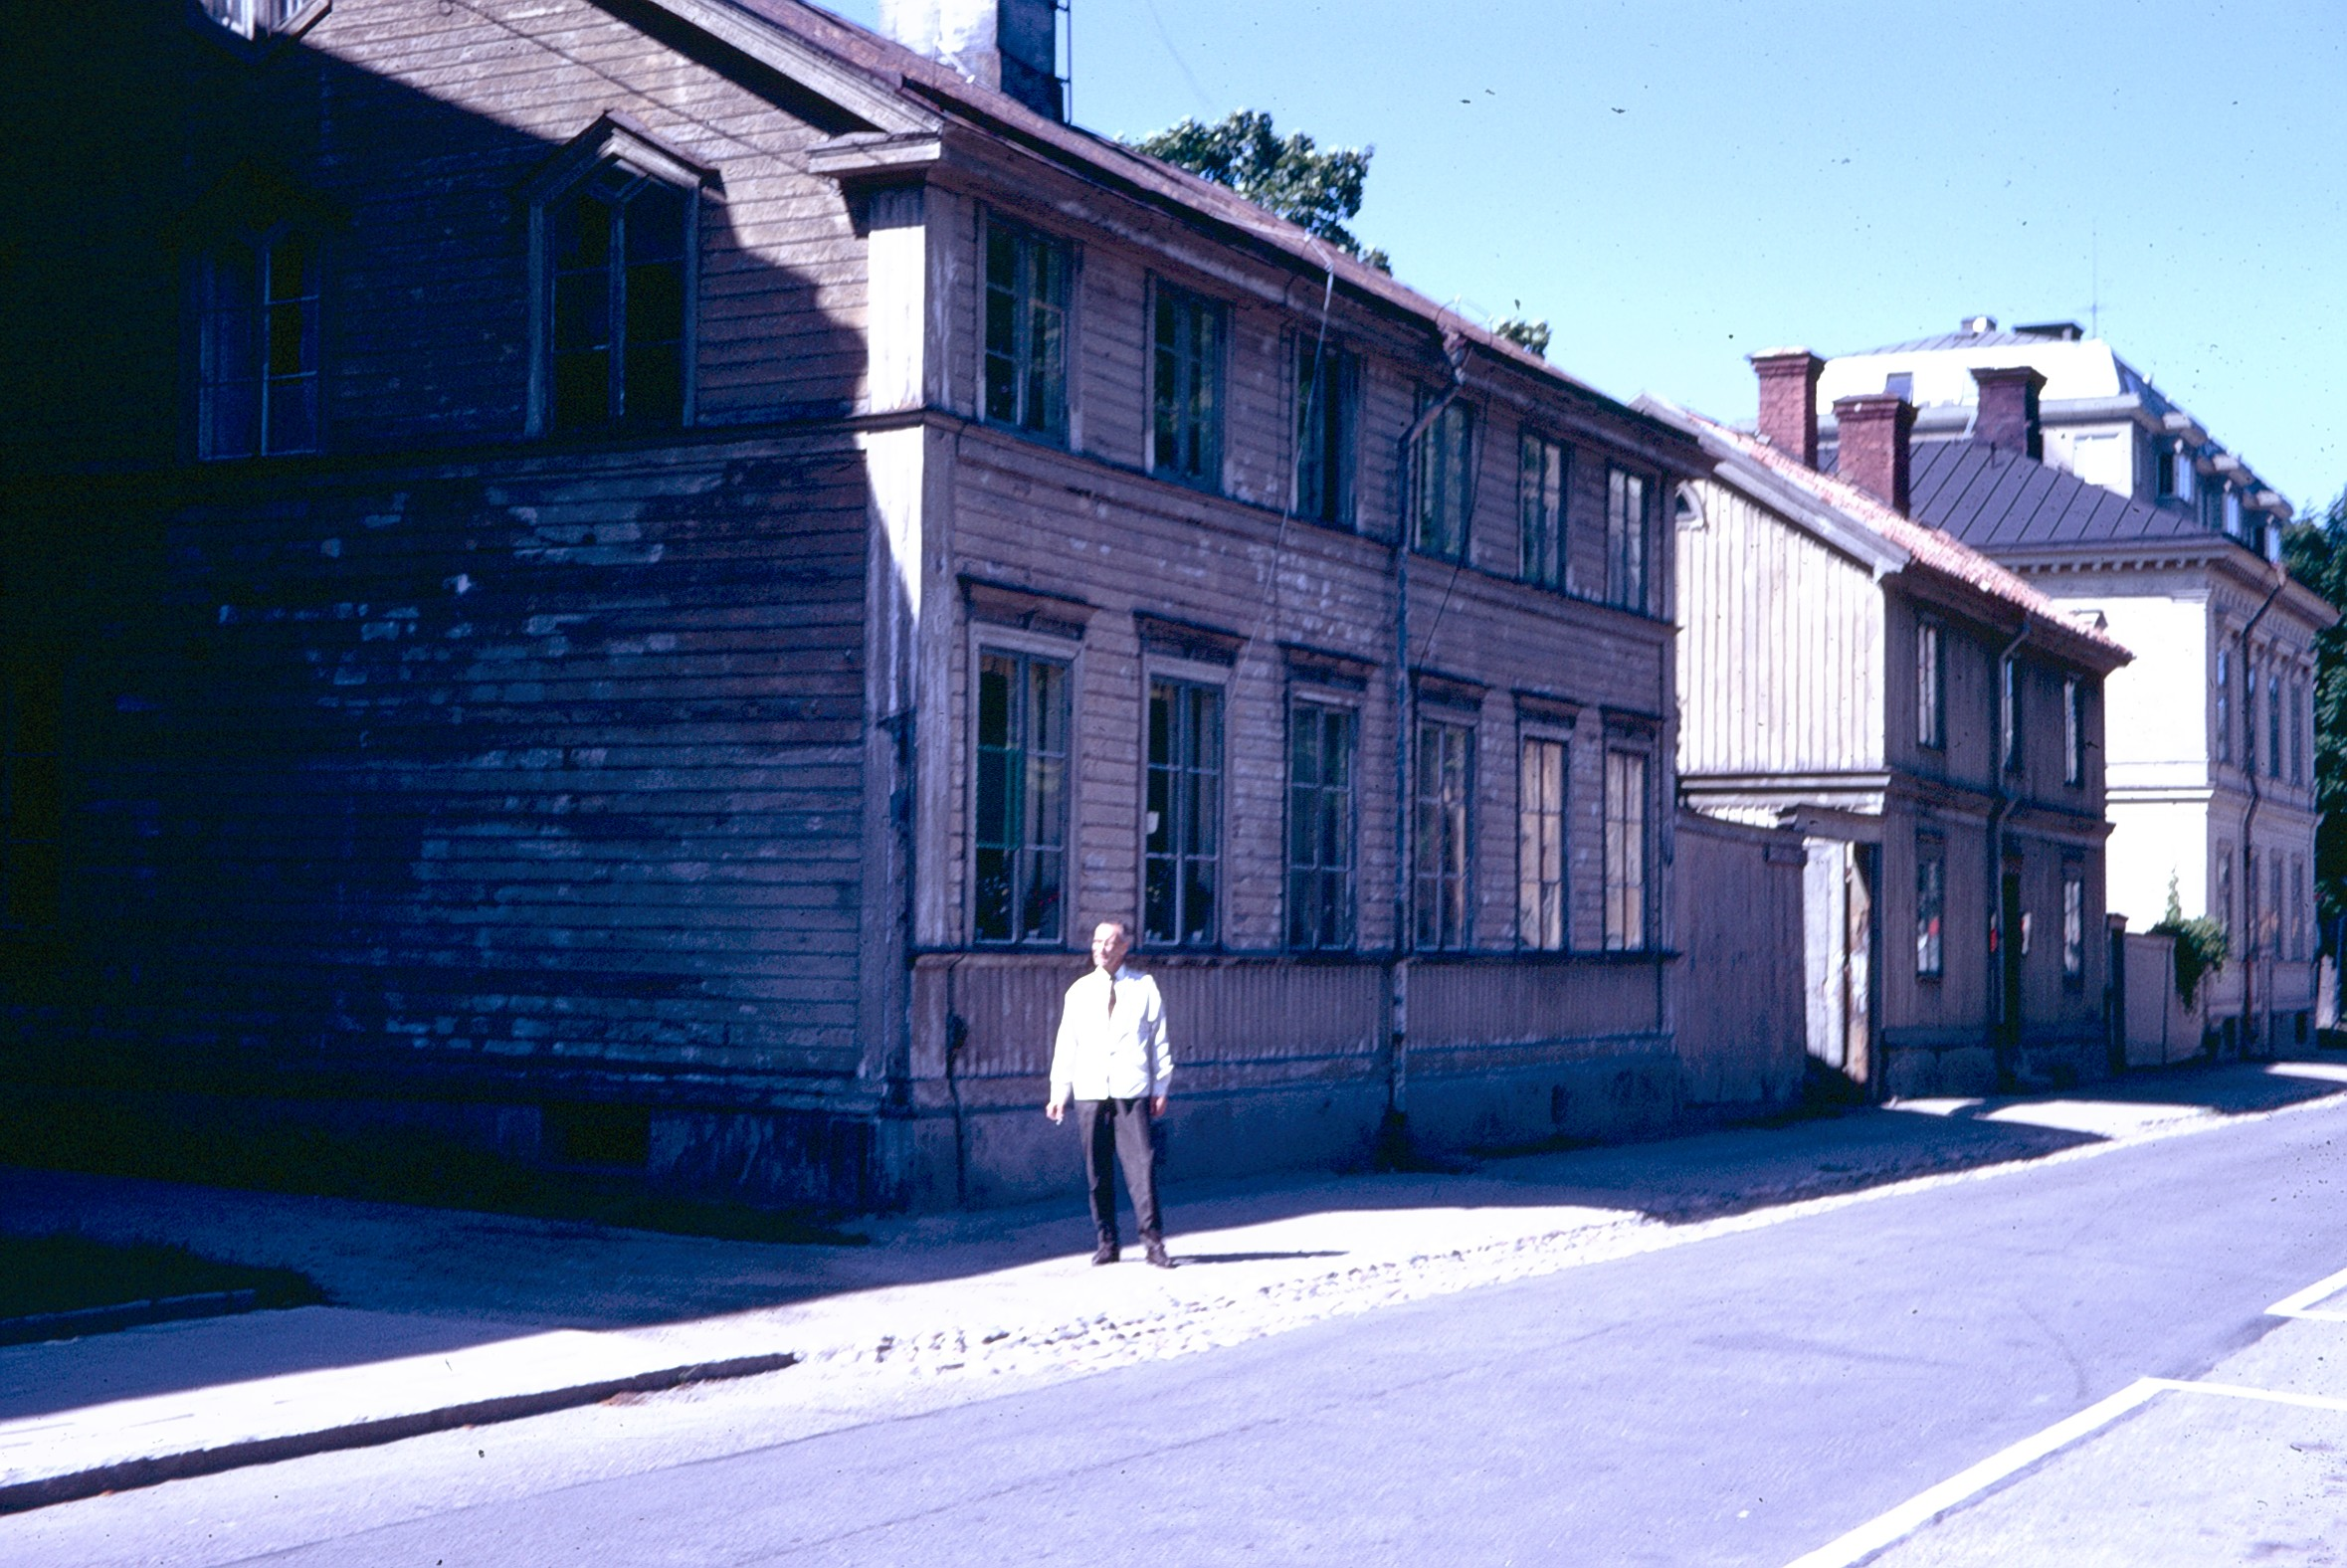 Norra Slottsgatan 13